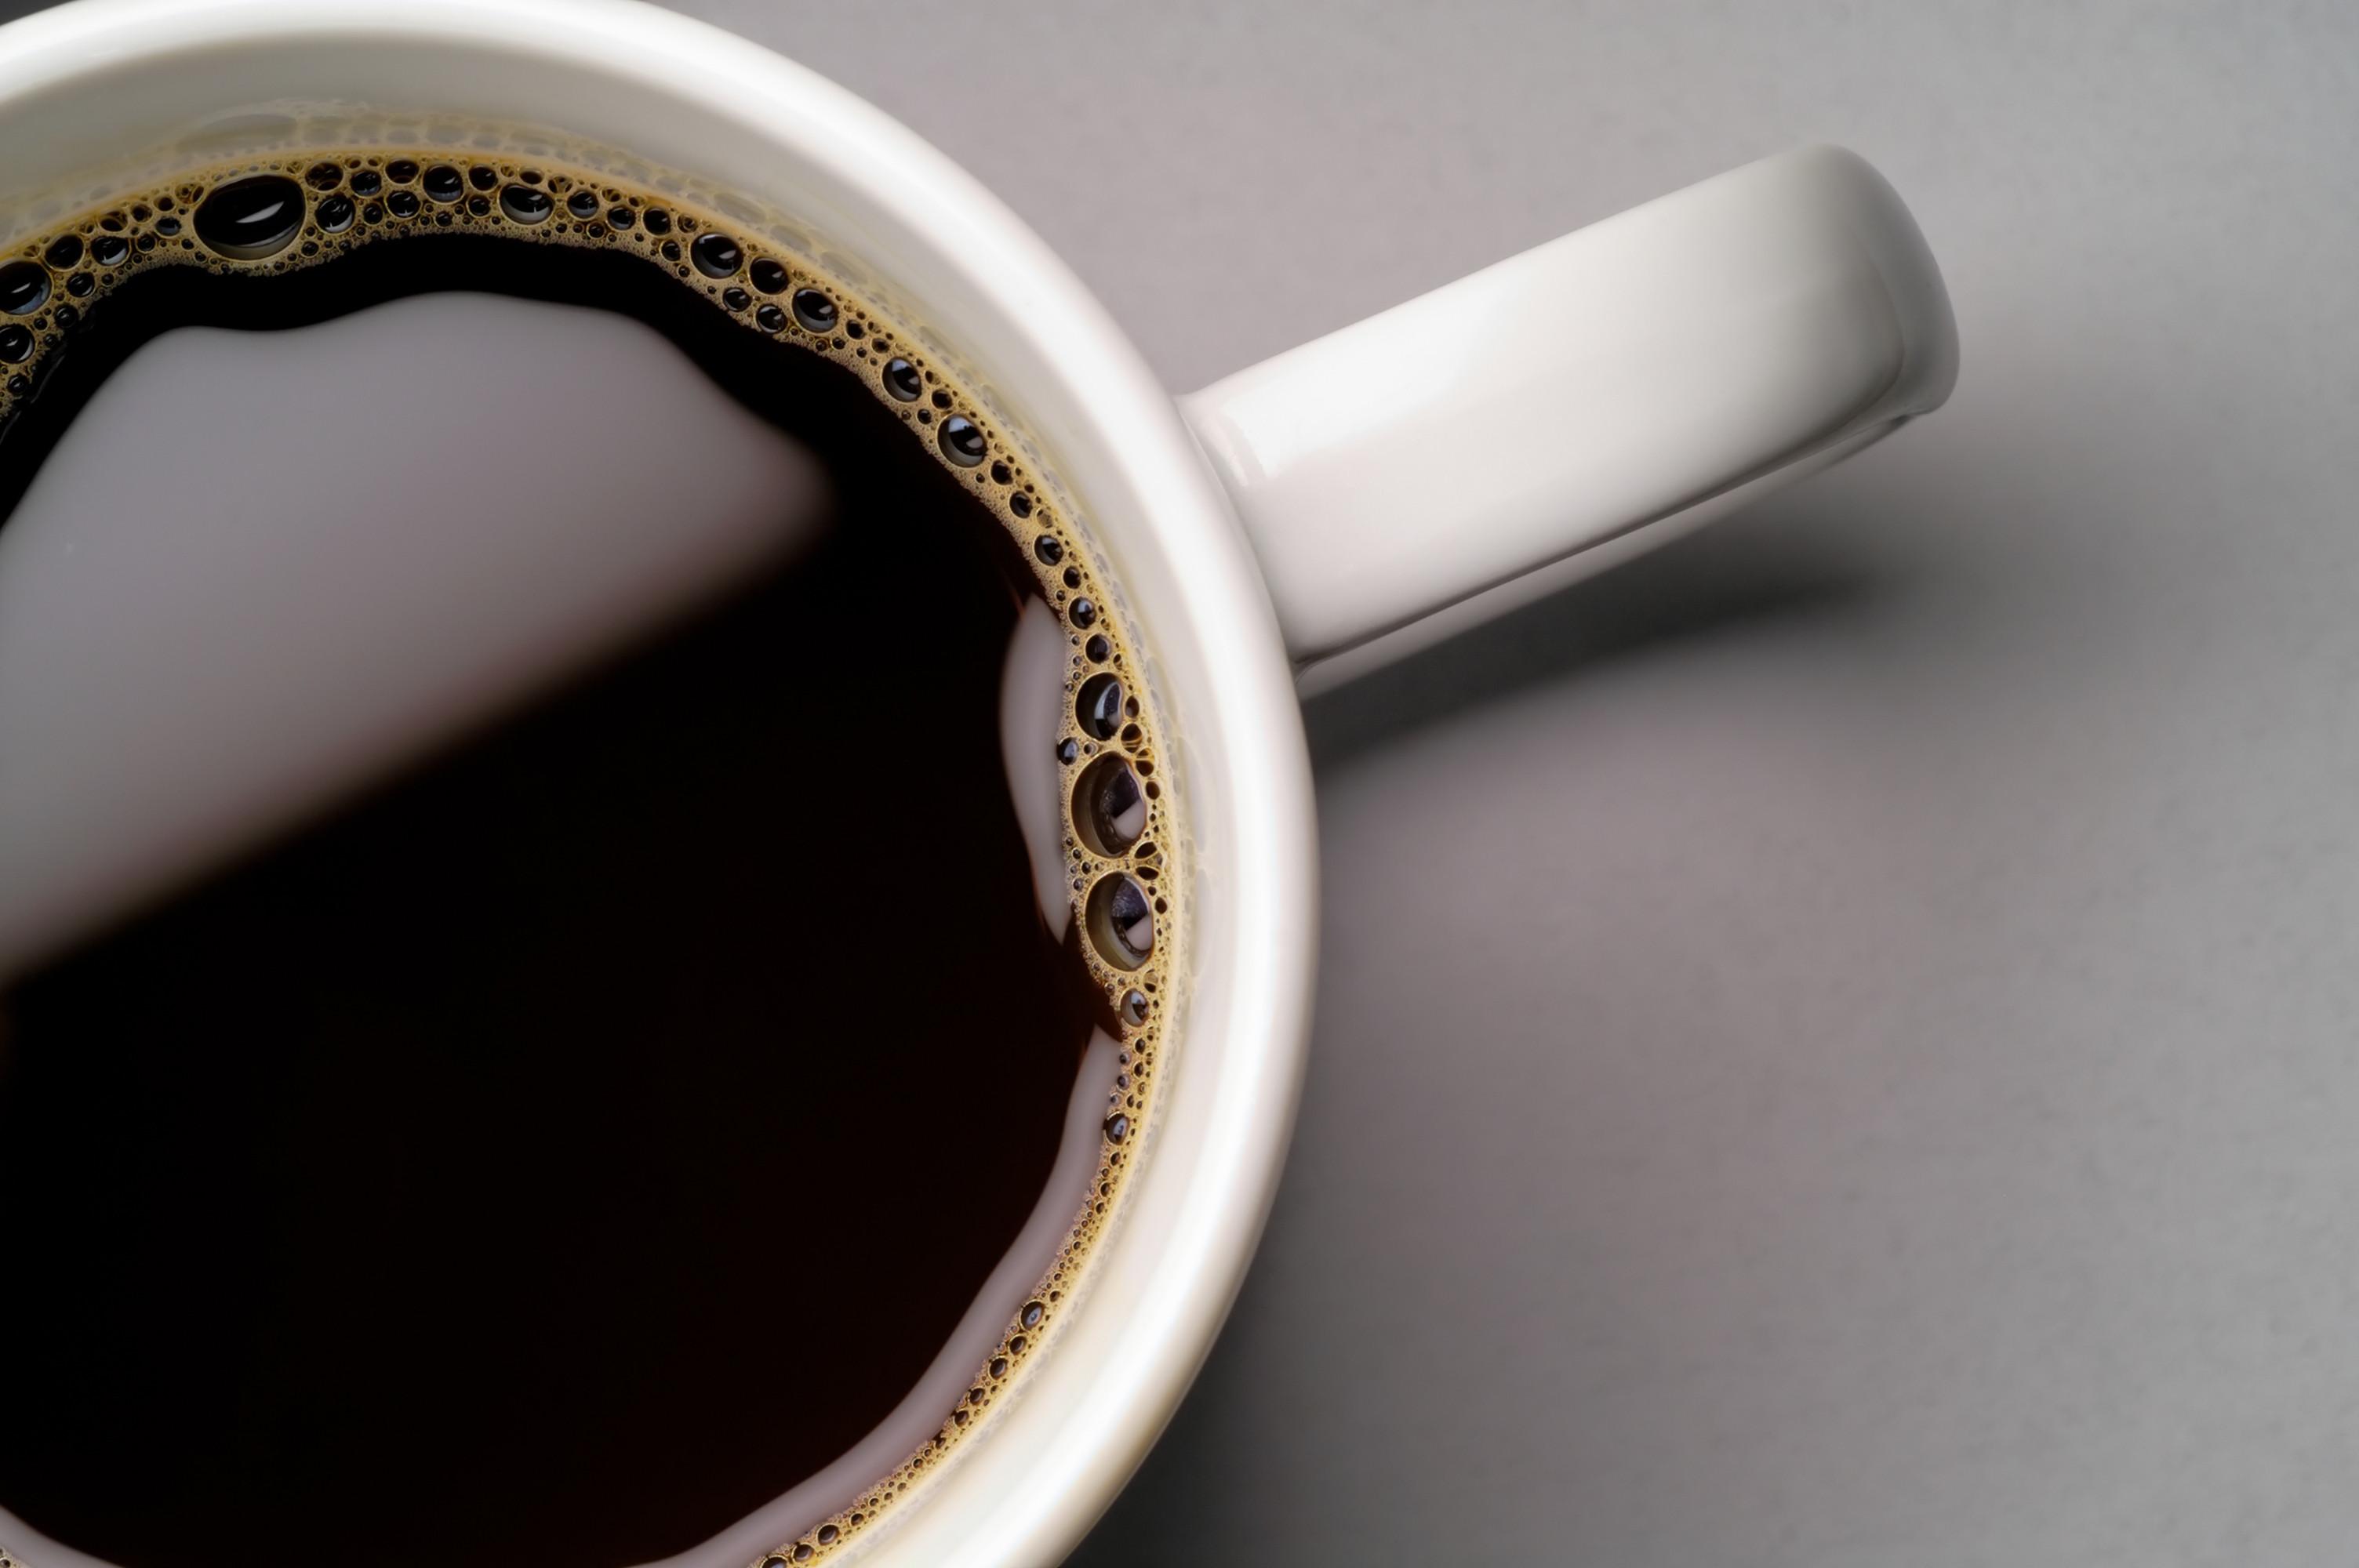 bigstock-Coffee-Cup-Cup-Of-Coffee-1375146